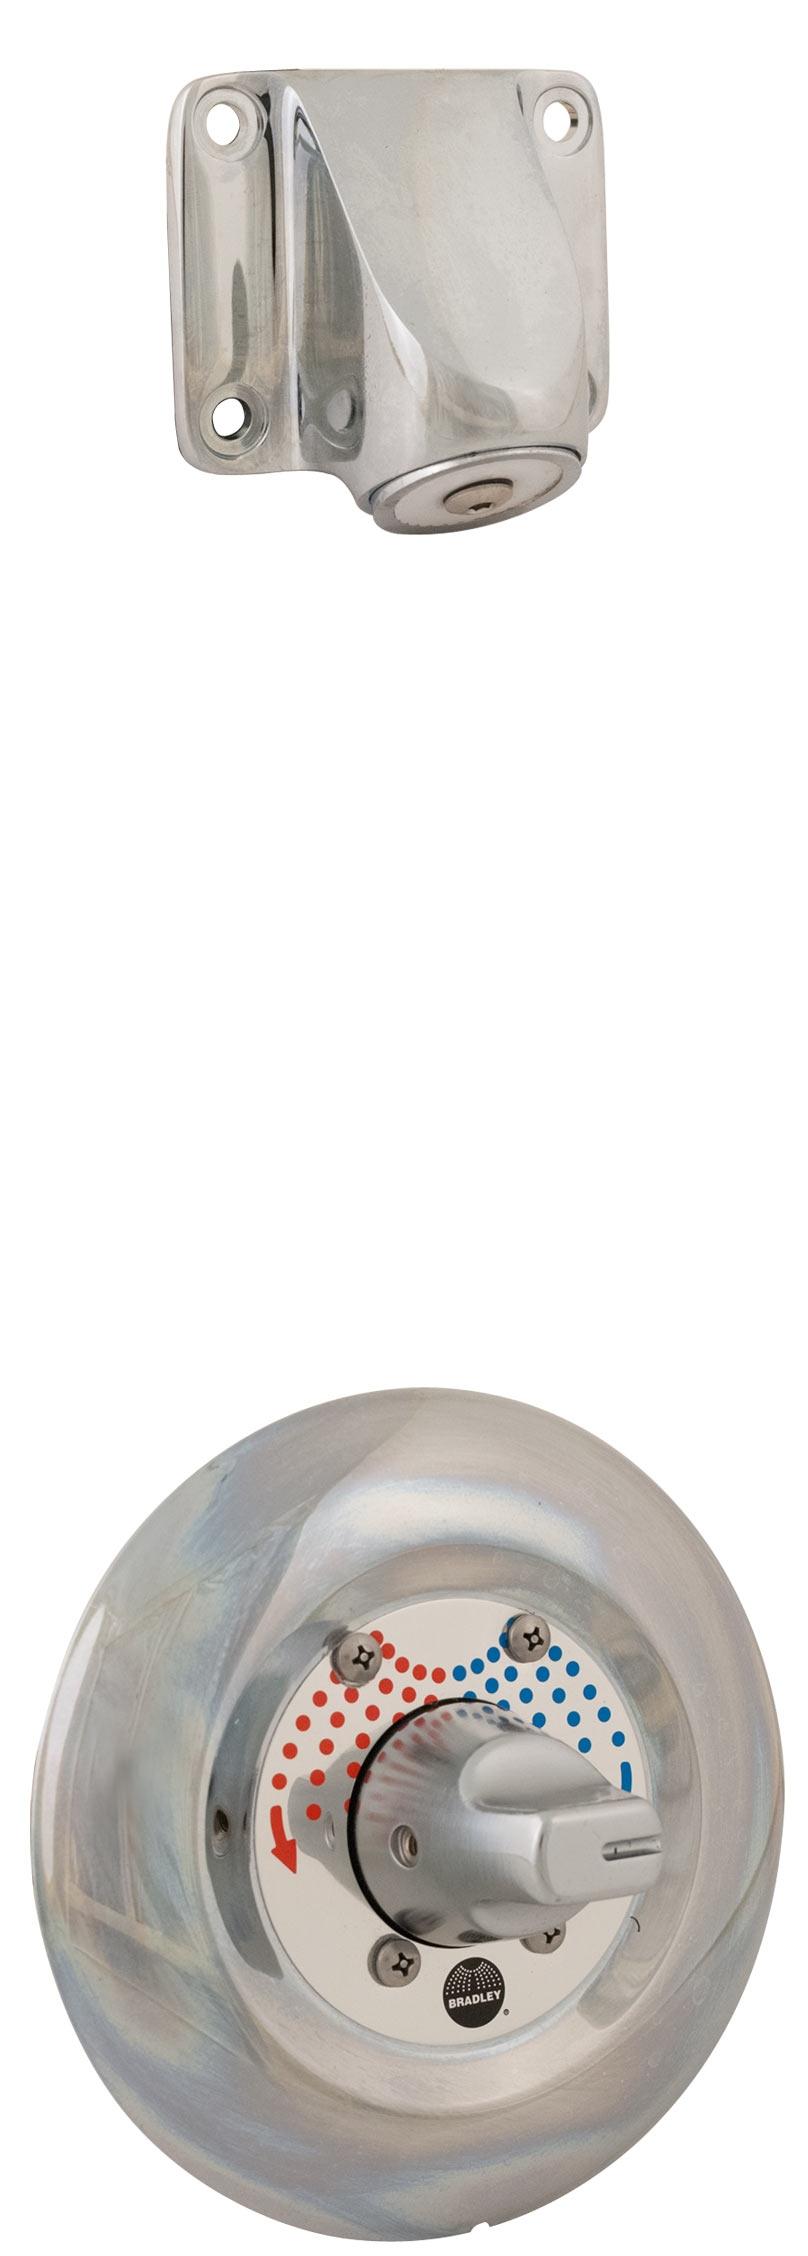 Ideas, ligature resistant wall shower bradley corporation for size 808 x 2256  .